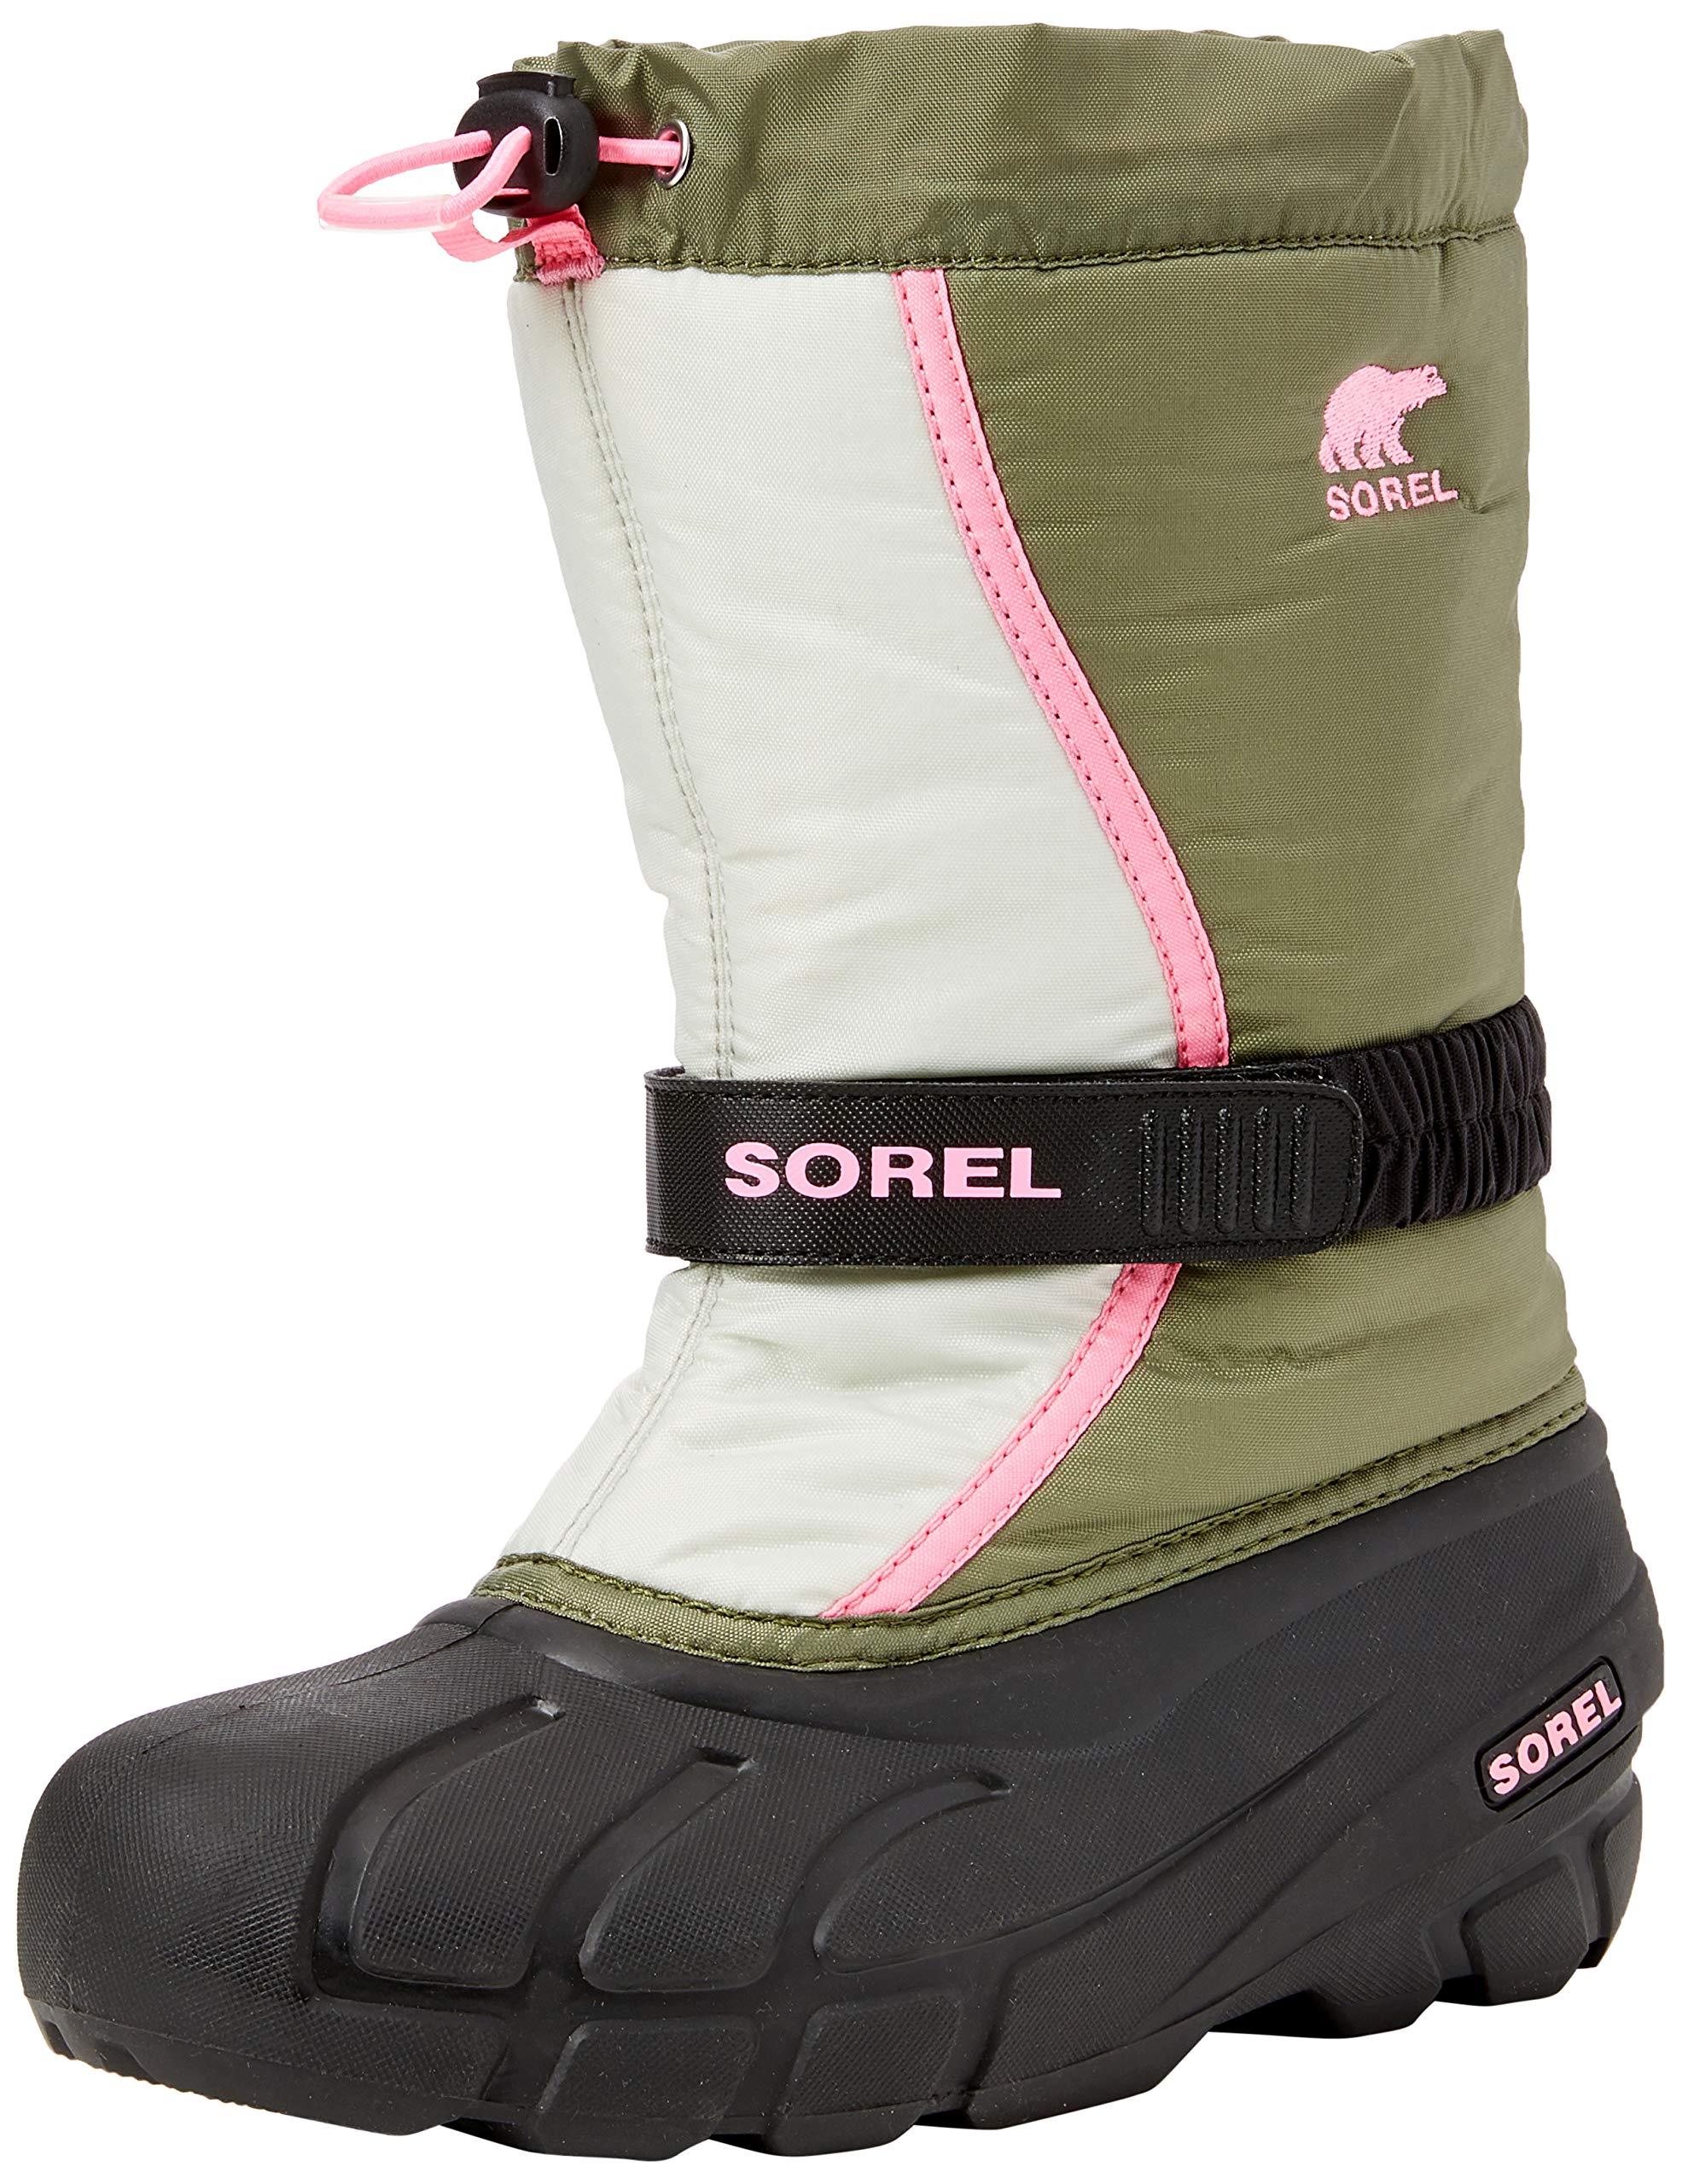 Sorel Girls' Youth Flurry Snow Boot, Hiker Green, Bubblegum, 5 M US Big Kid by Sorel (Image #1)